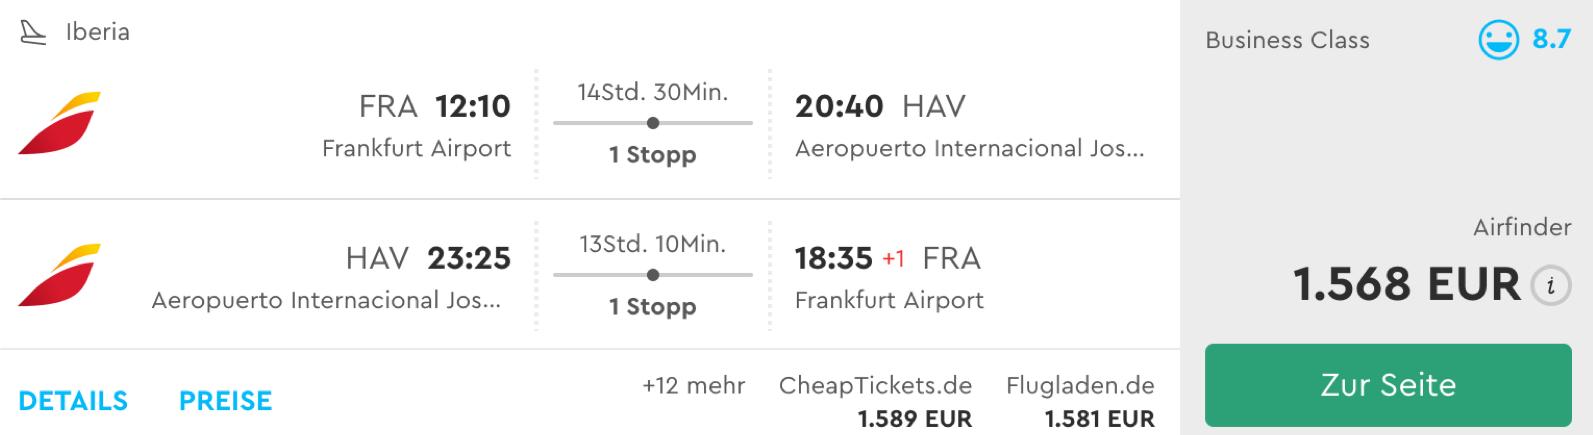 Günstige Iberia Business Class Flüge nach Kuba